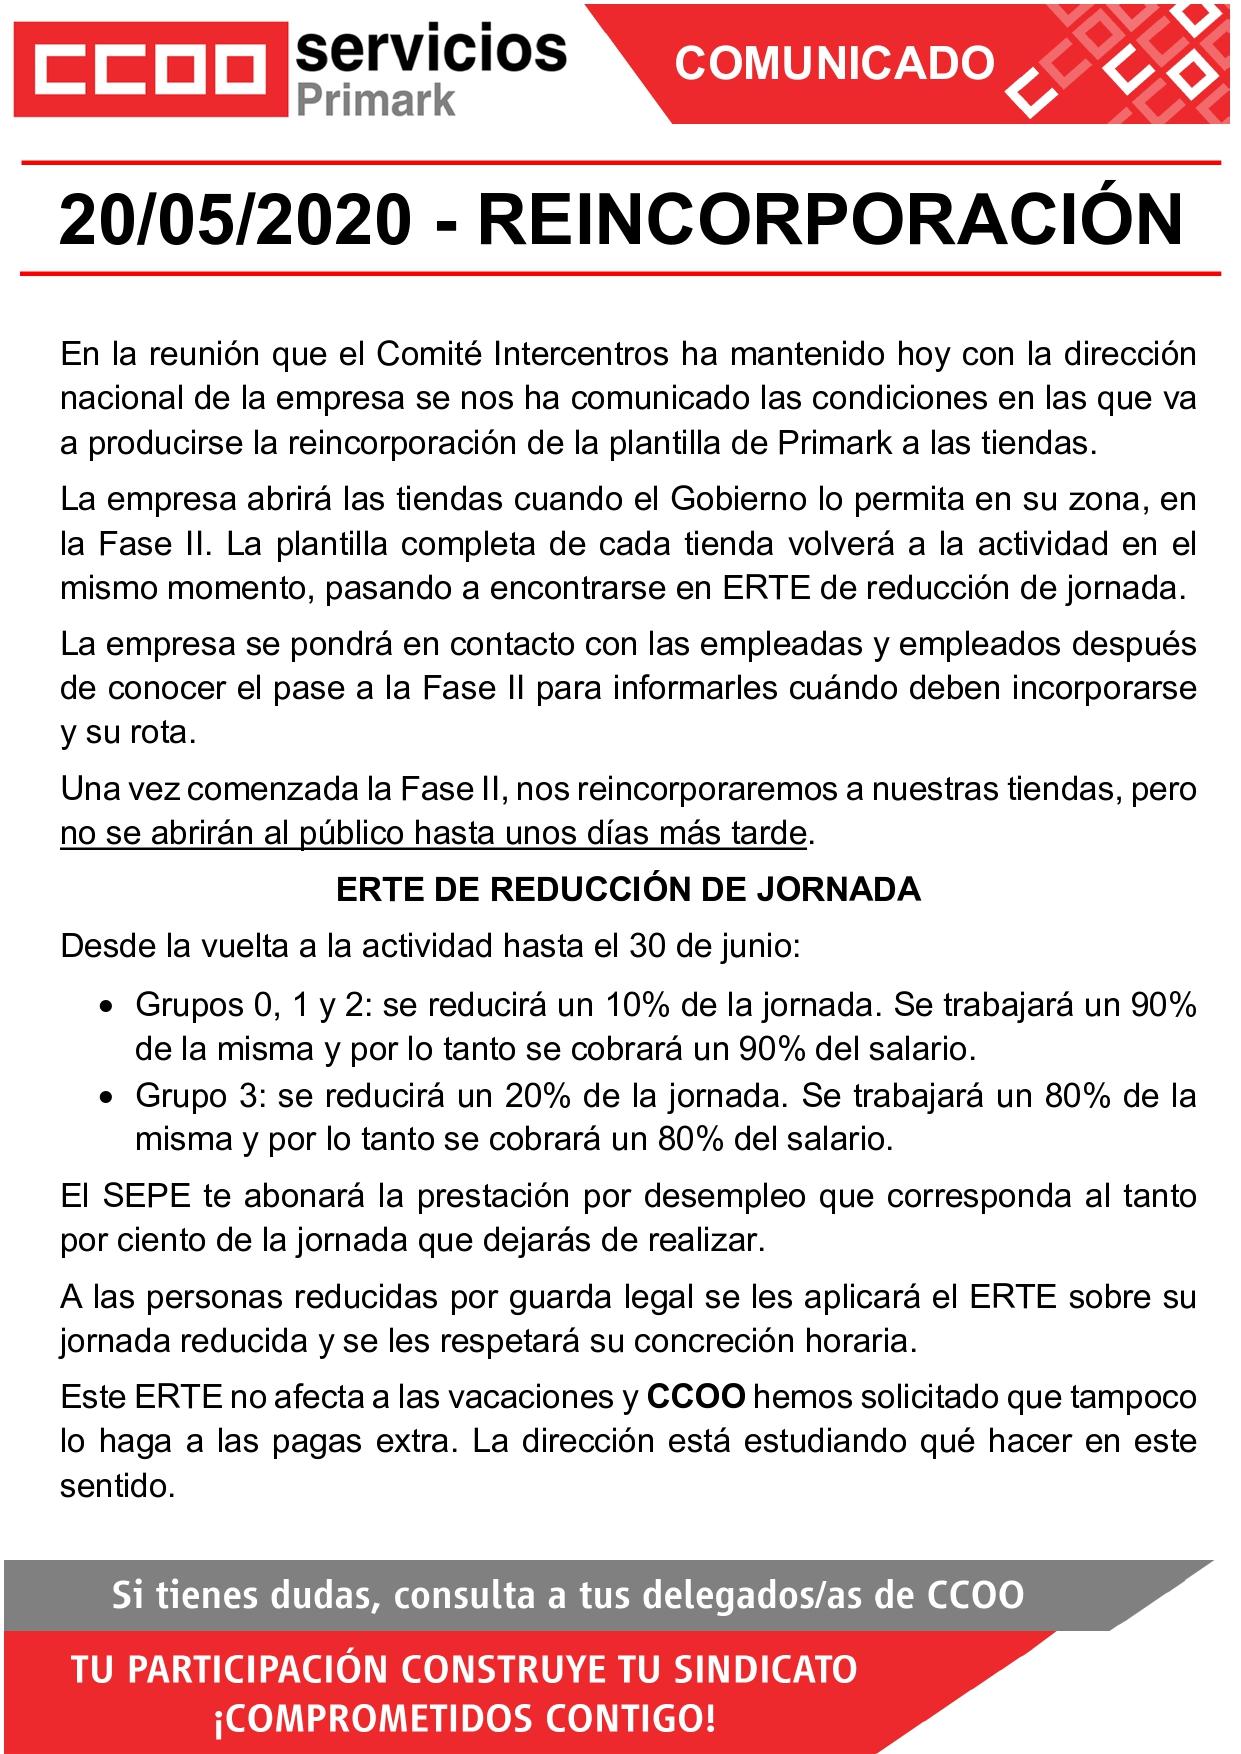 CCOO PRIMARK CORONAVIRUS COVID19 REAPERTURA REUNIÓN INTERCENTROS